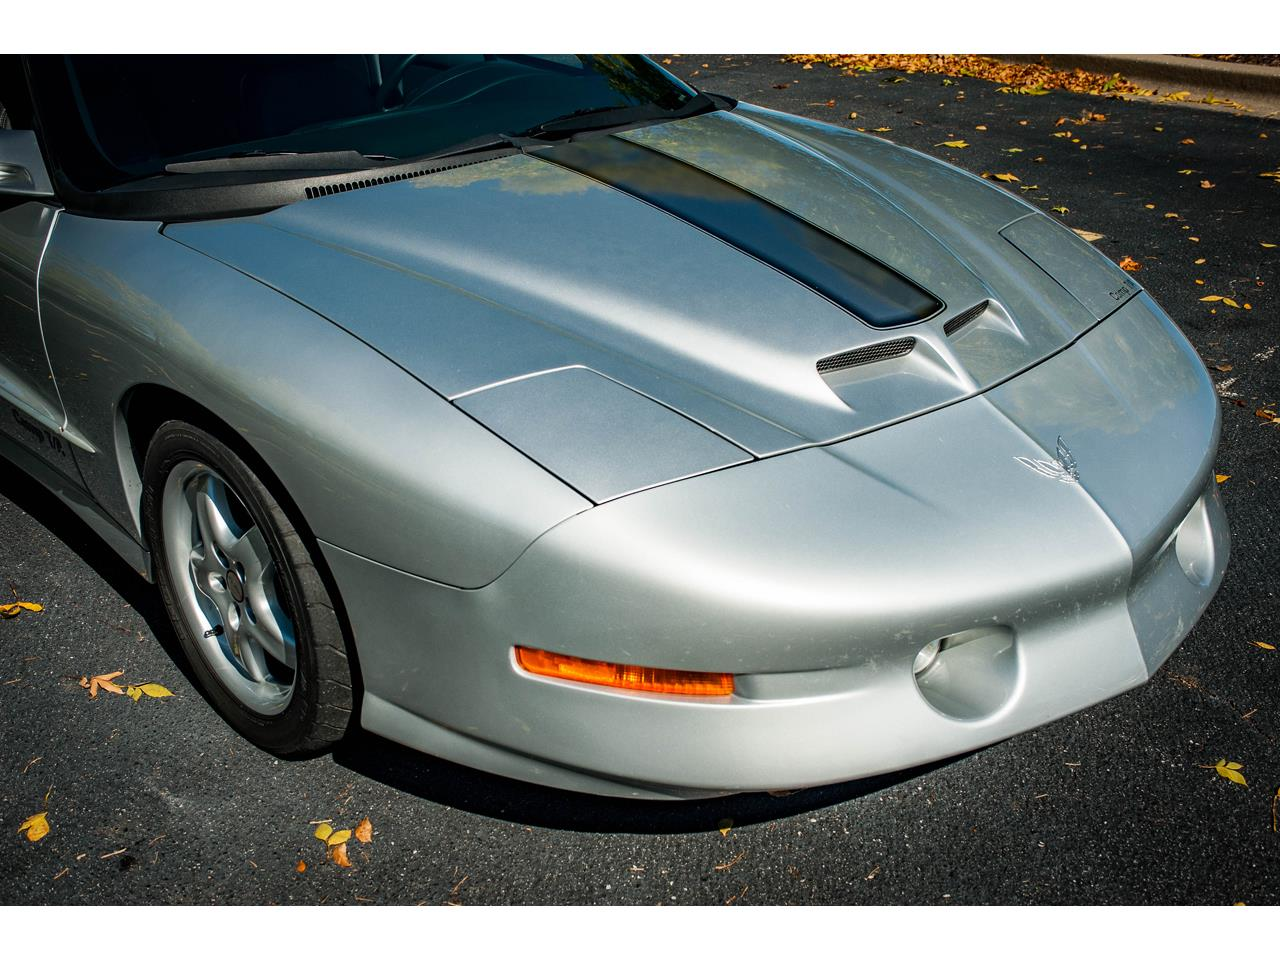 1997 Pontiac Firebird Trans Am (CC-1420078) for sale in O'Fallon, Illinois